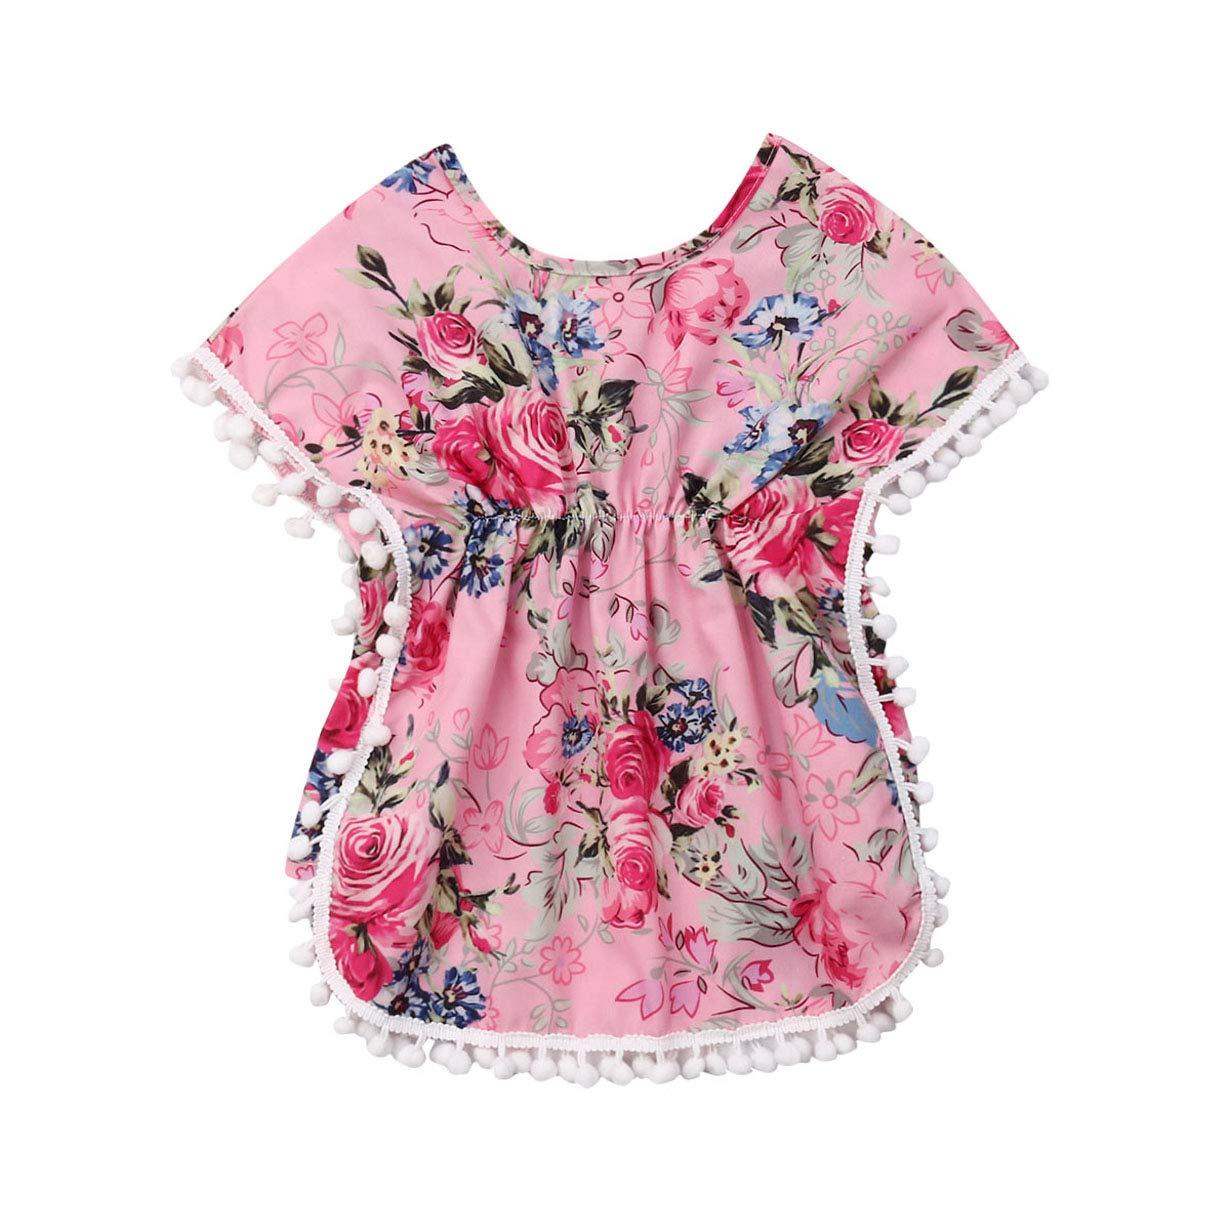 GuliriFei Toddler Baby Girls Swimwear Cover-ups Cotton Linen Cactus Beach Tassel Sundress Summer Poncho